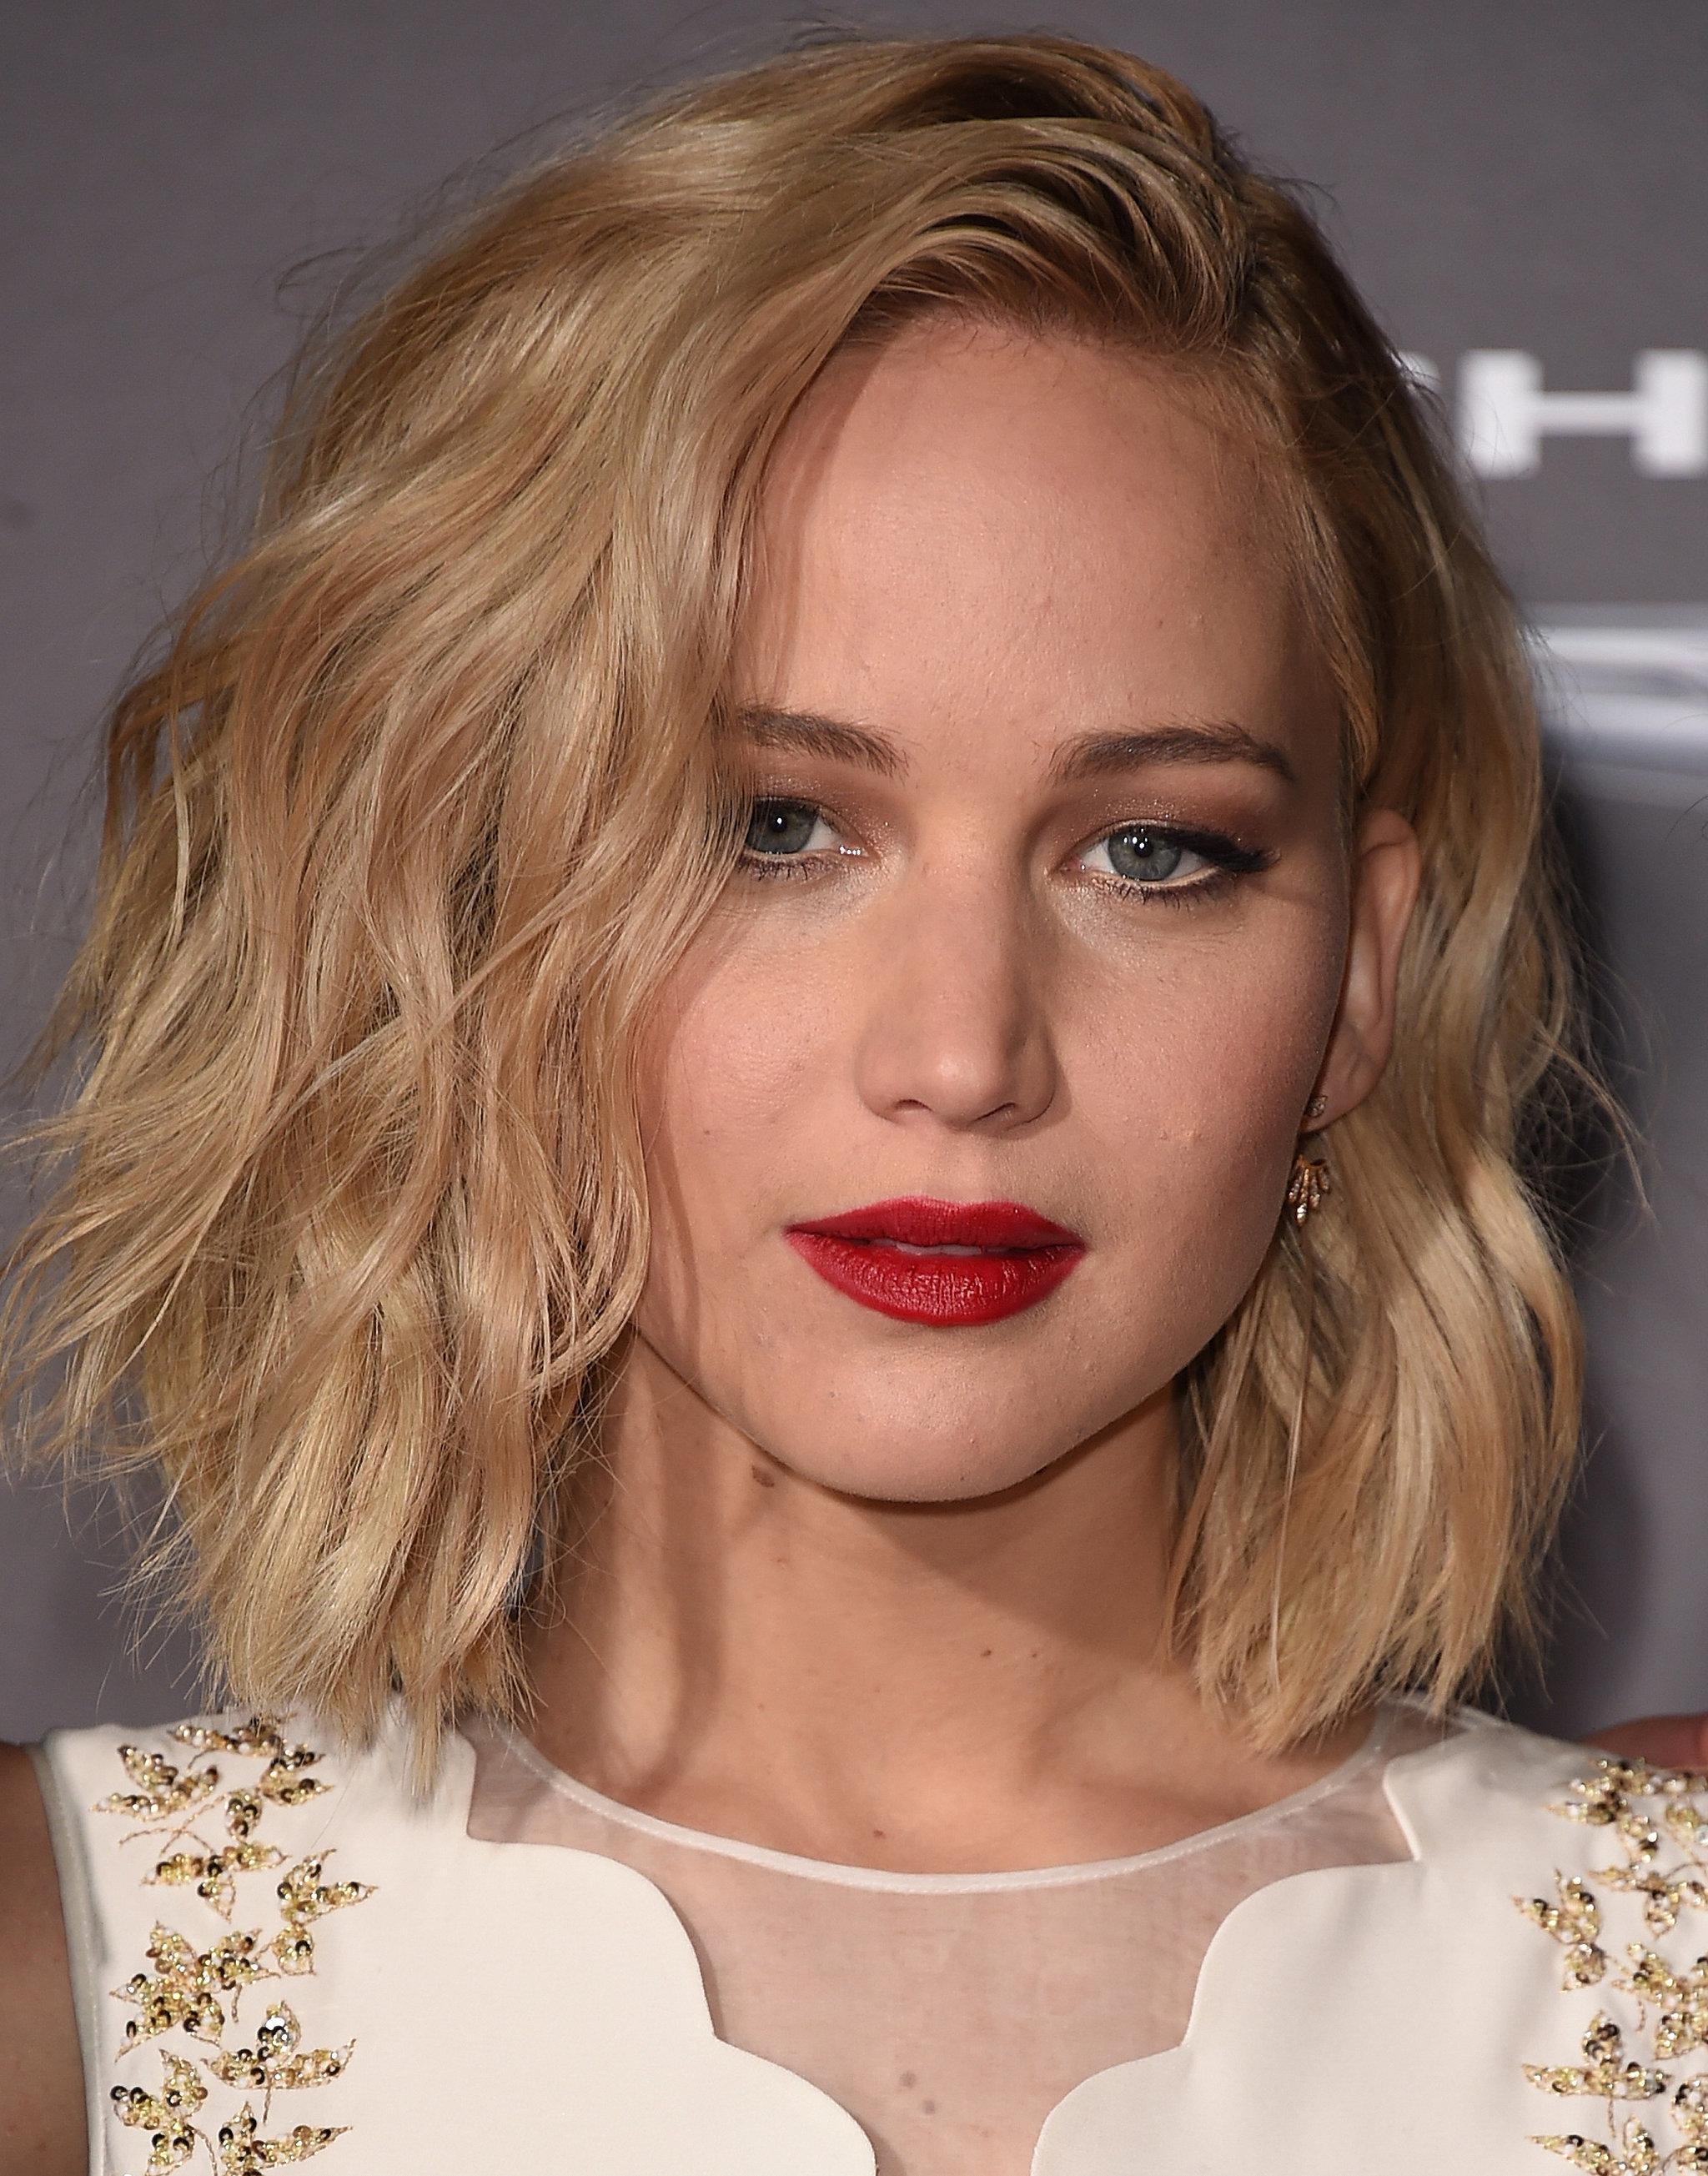 Makeup Beauty Hair Amp Skin Was 2015 Jennifer Lawrences